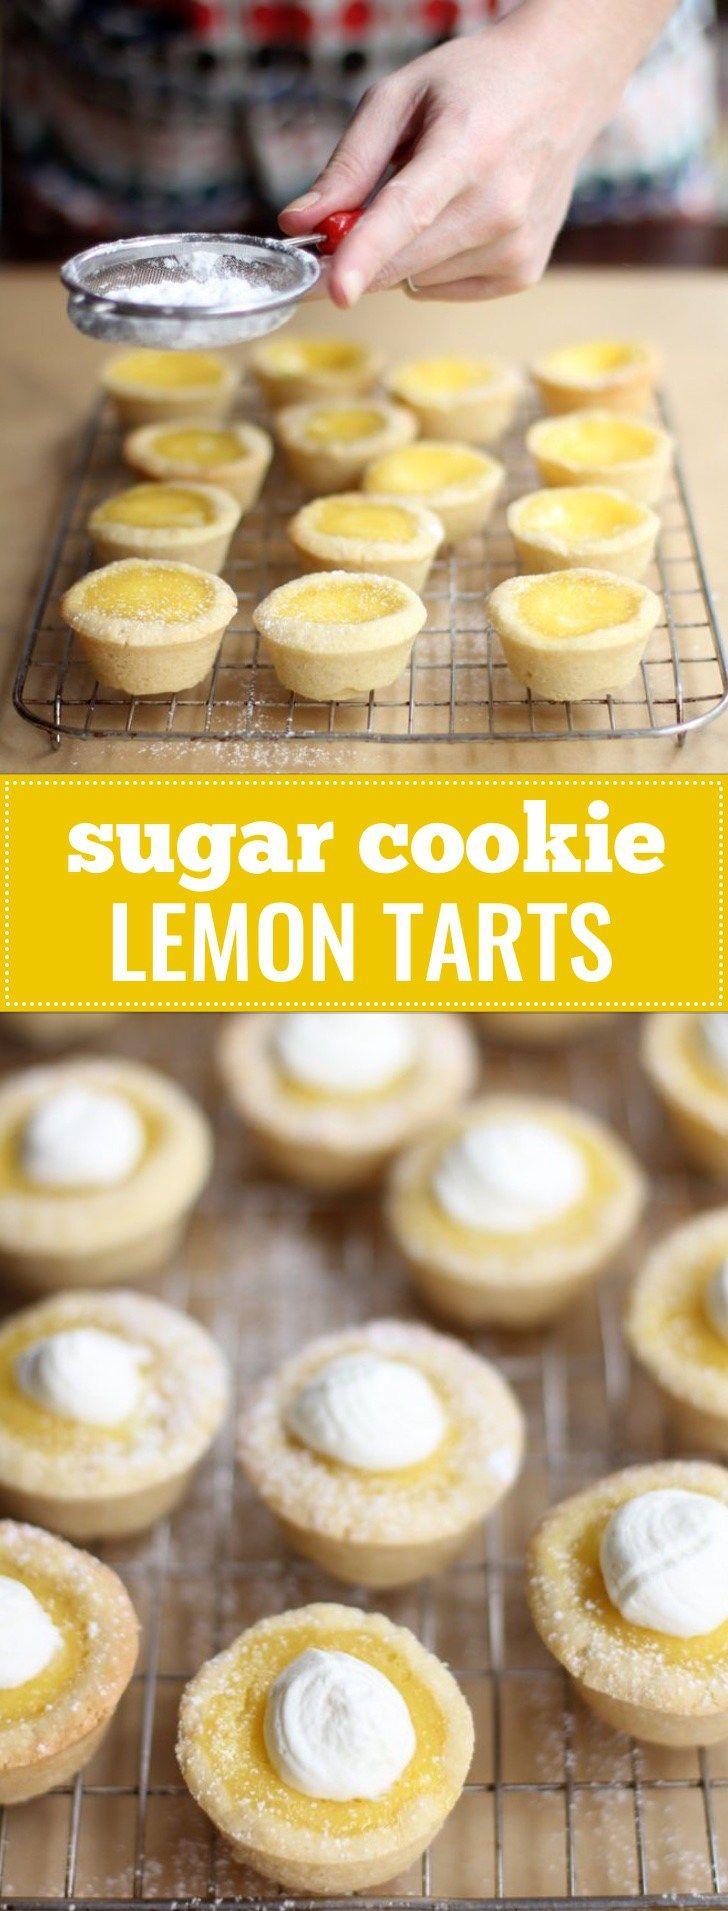 recipe: lemon curd filling for tarts [23]